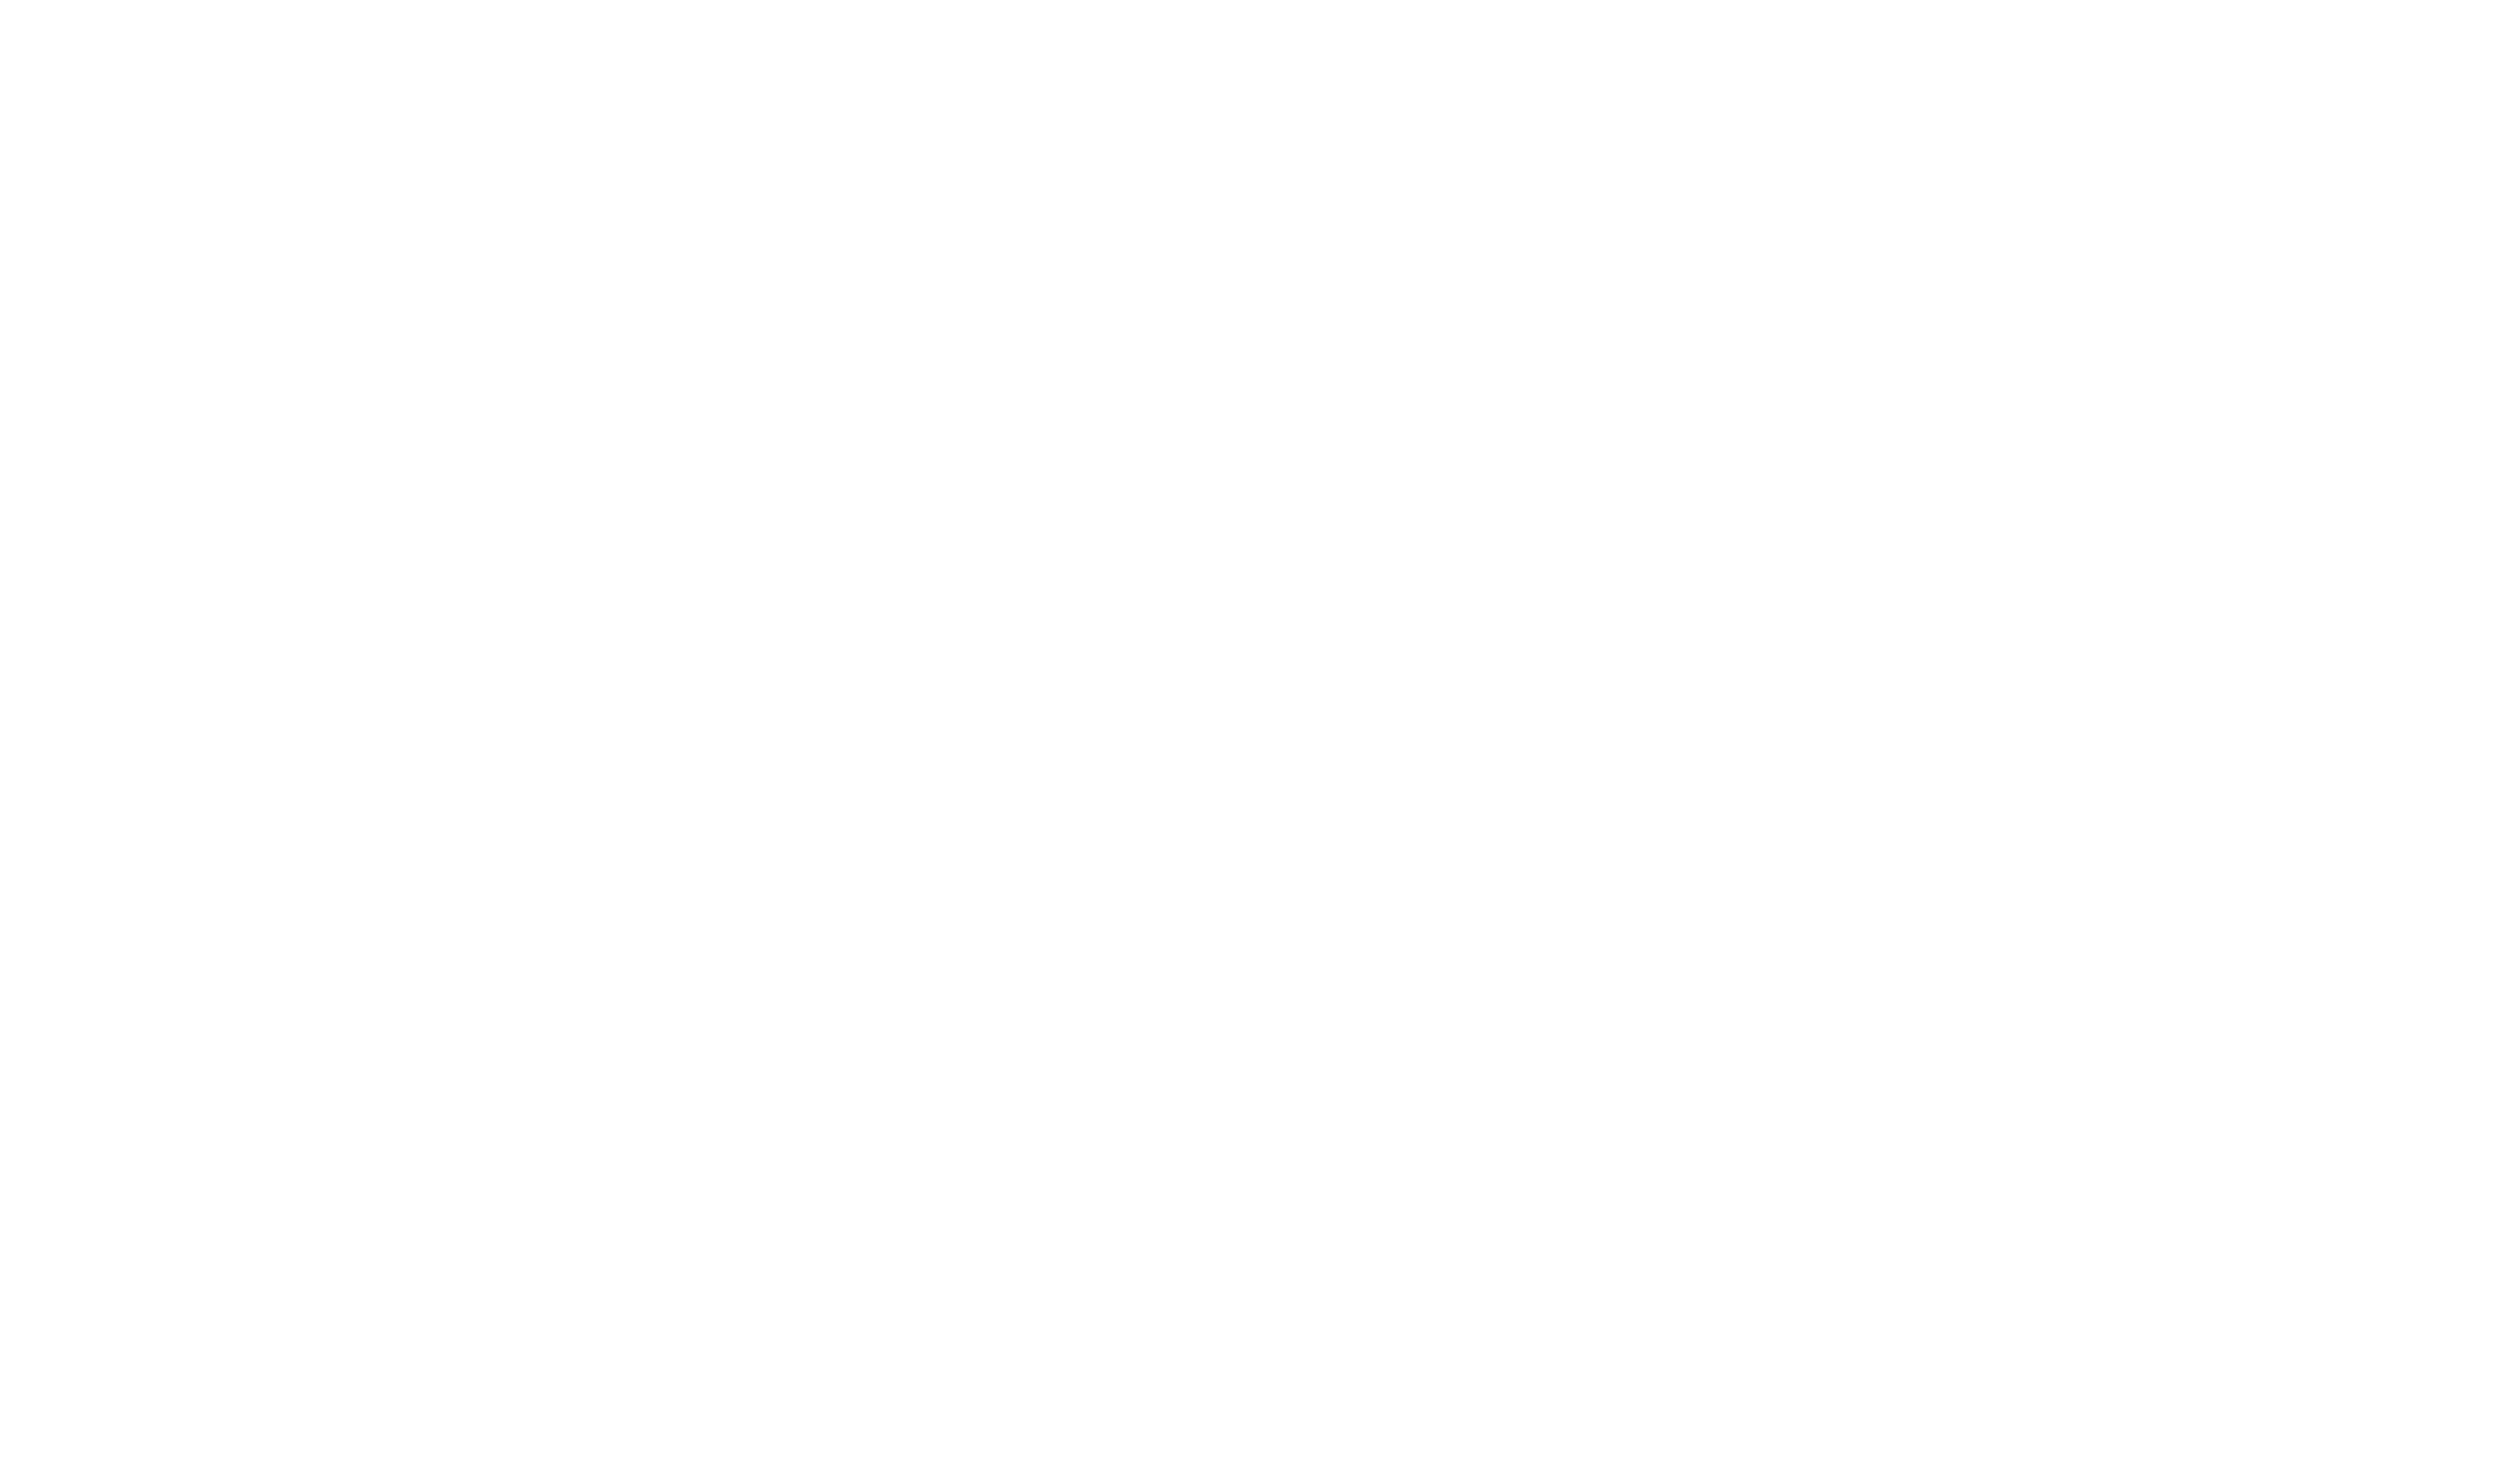 Competitive-Unit-Chart-1